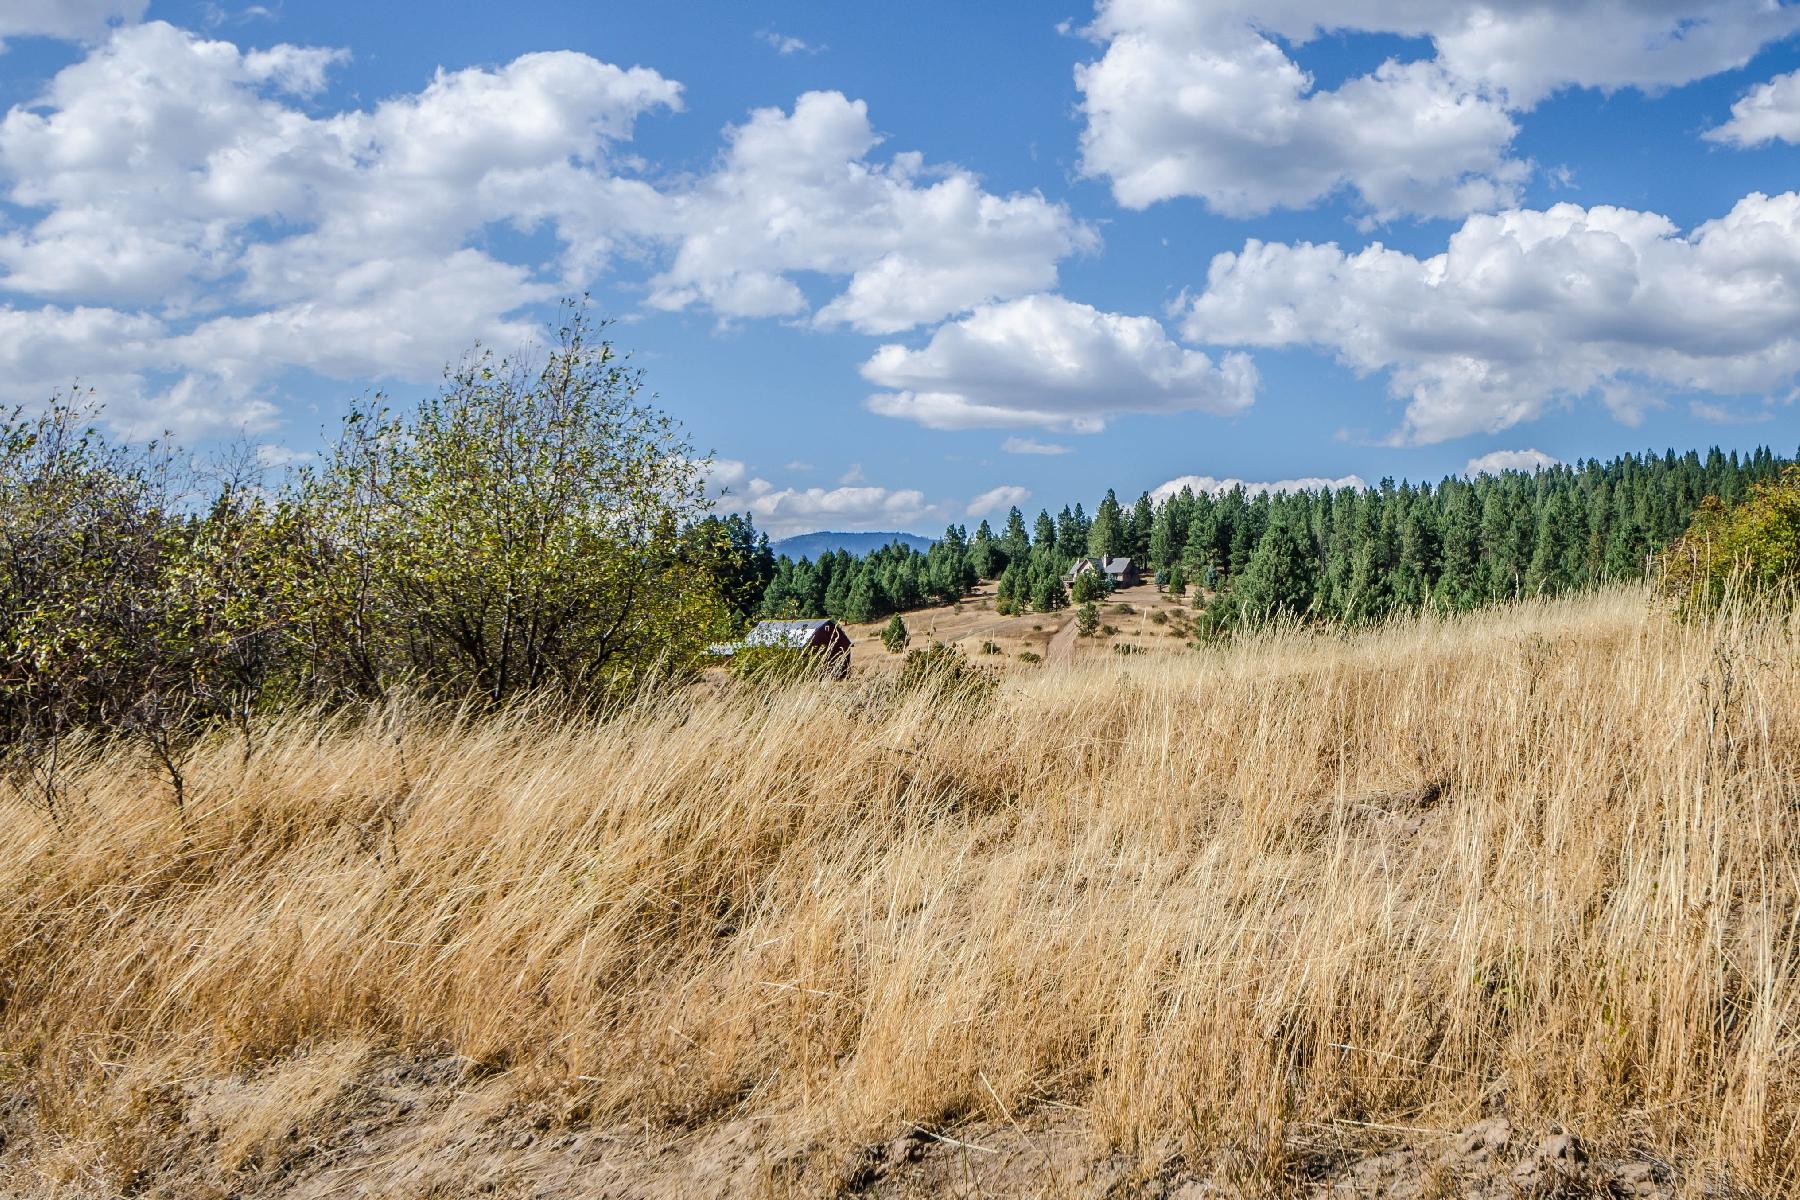 Villa per Vendita alle ore Incredible property with beautiful vistas of the surrounding area 14793 W. Frost Road Worley, Idaho 83876 Stati Uniti